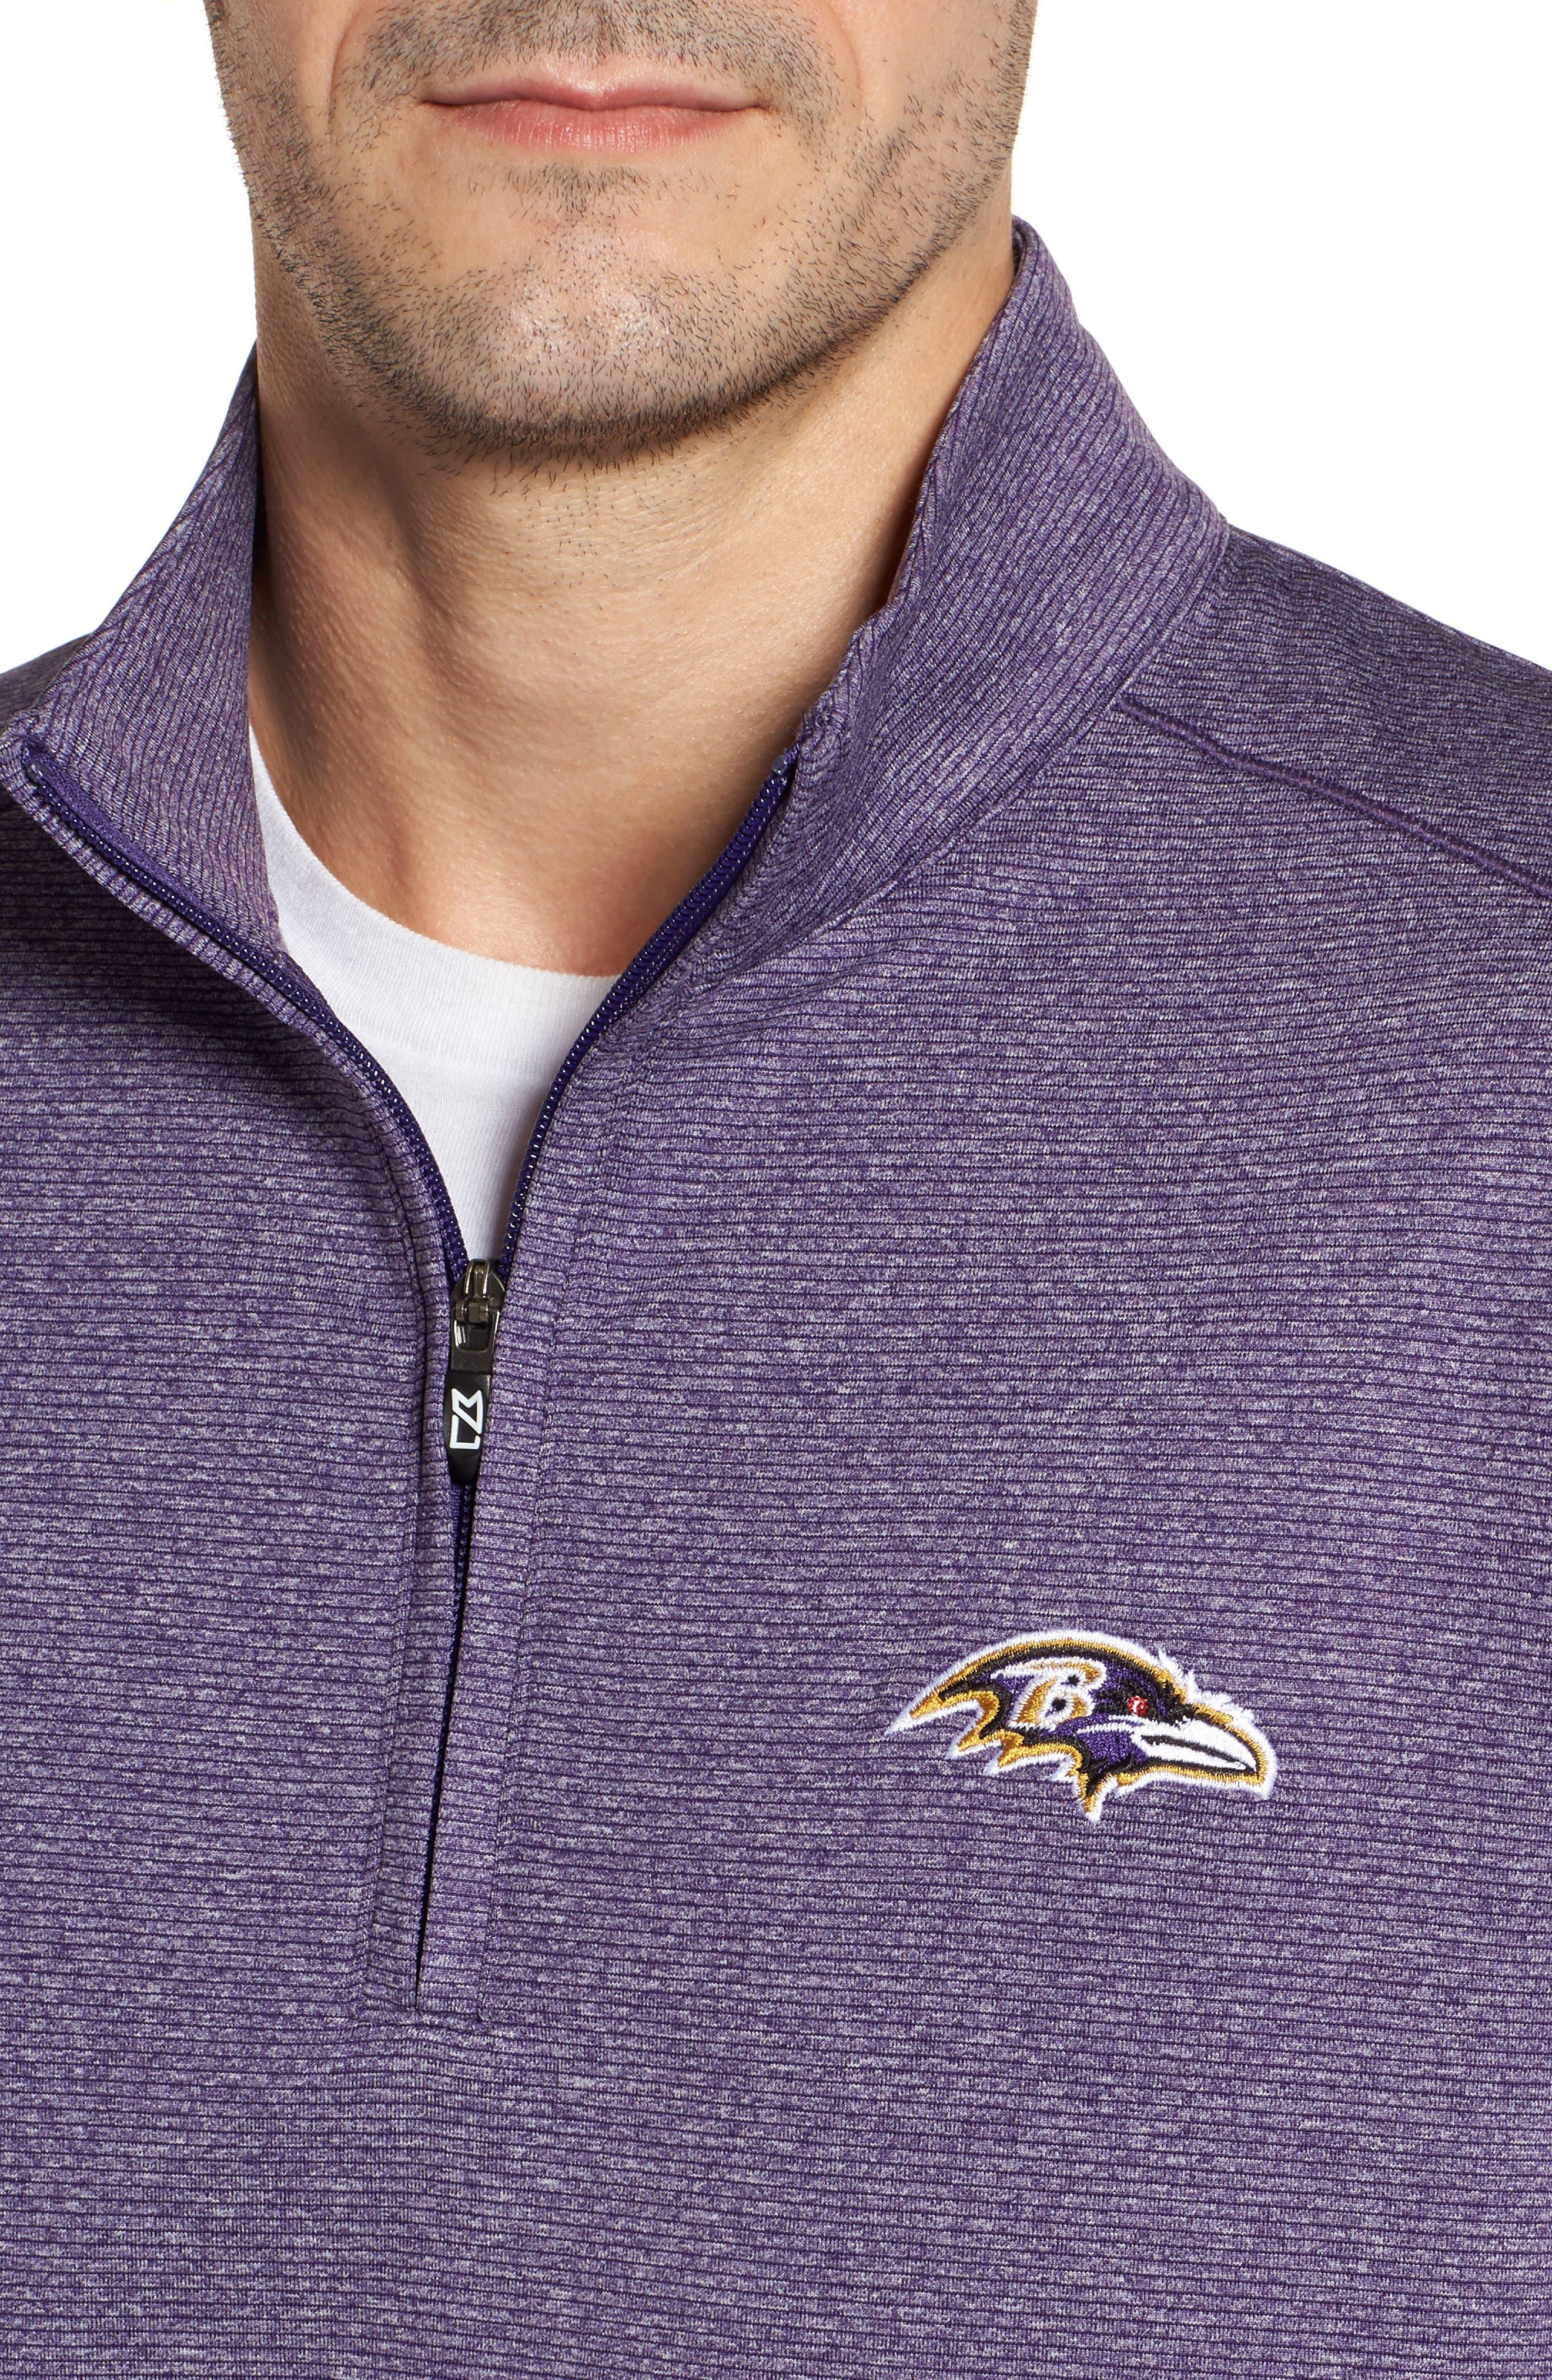 Shoreline - Baltimore Ravens Half Zip Pullover,                             Alternate thumbnail 4, color,                             College Purple Heather